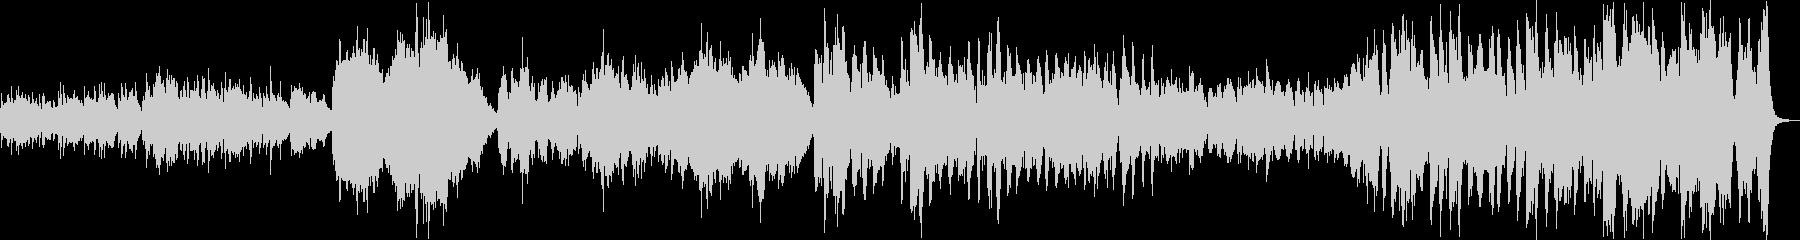 Inspiring orchestra's unreproduced waveform